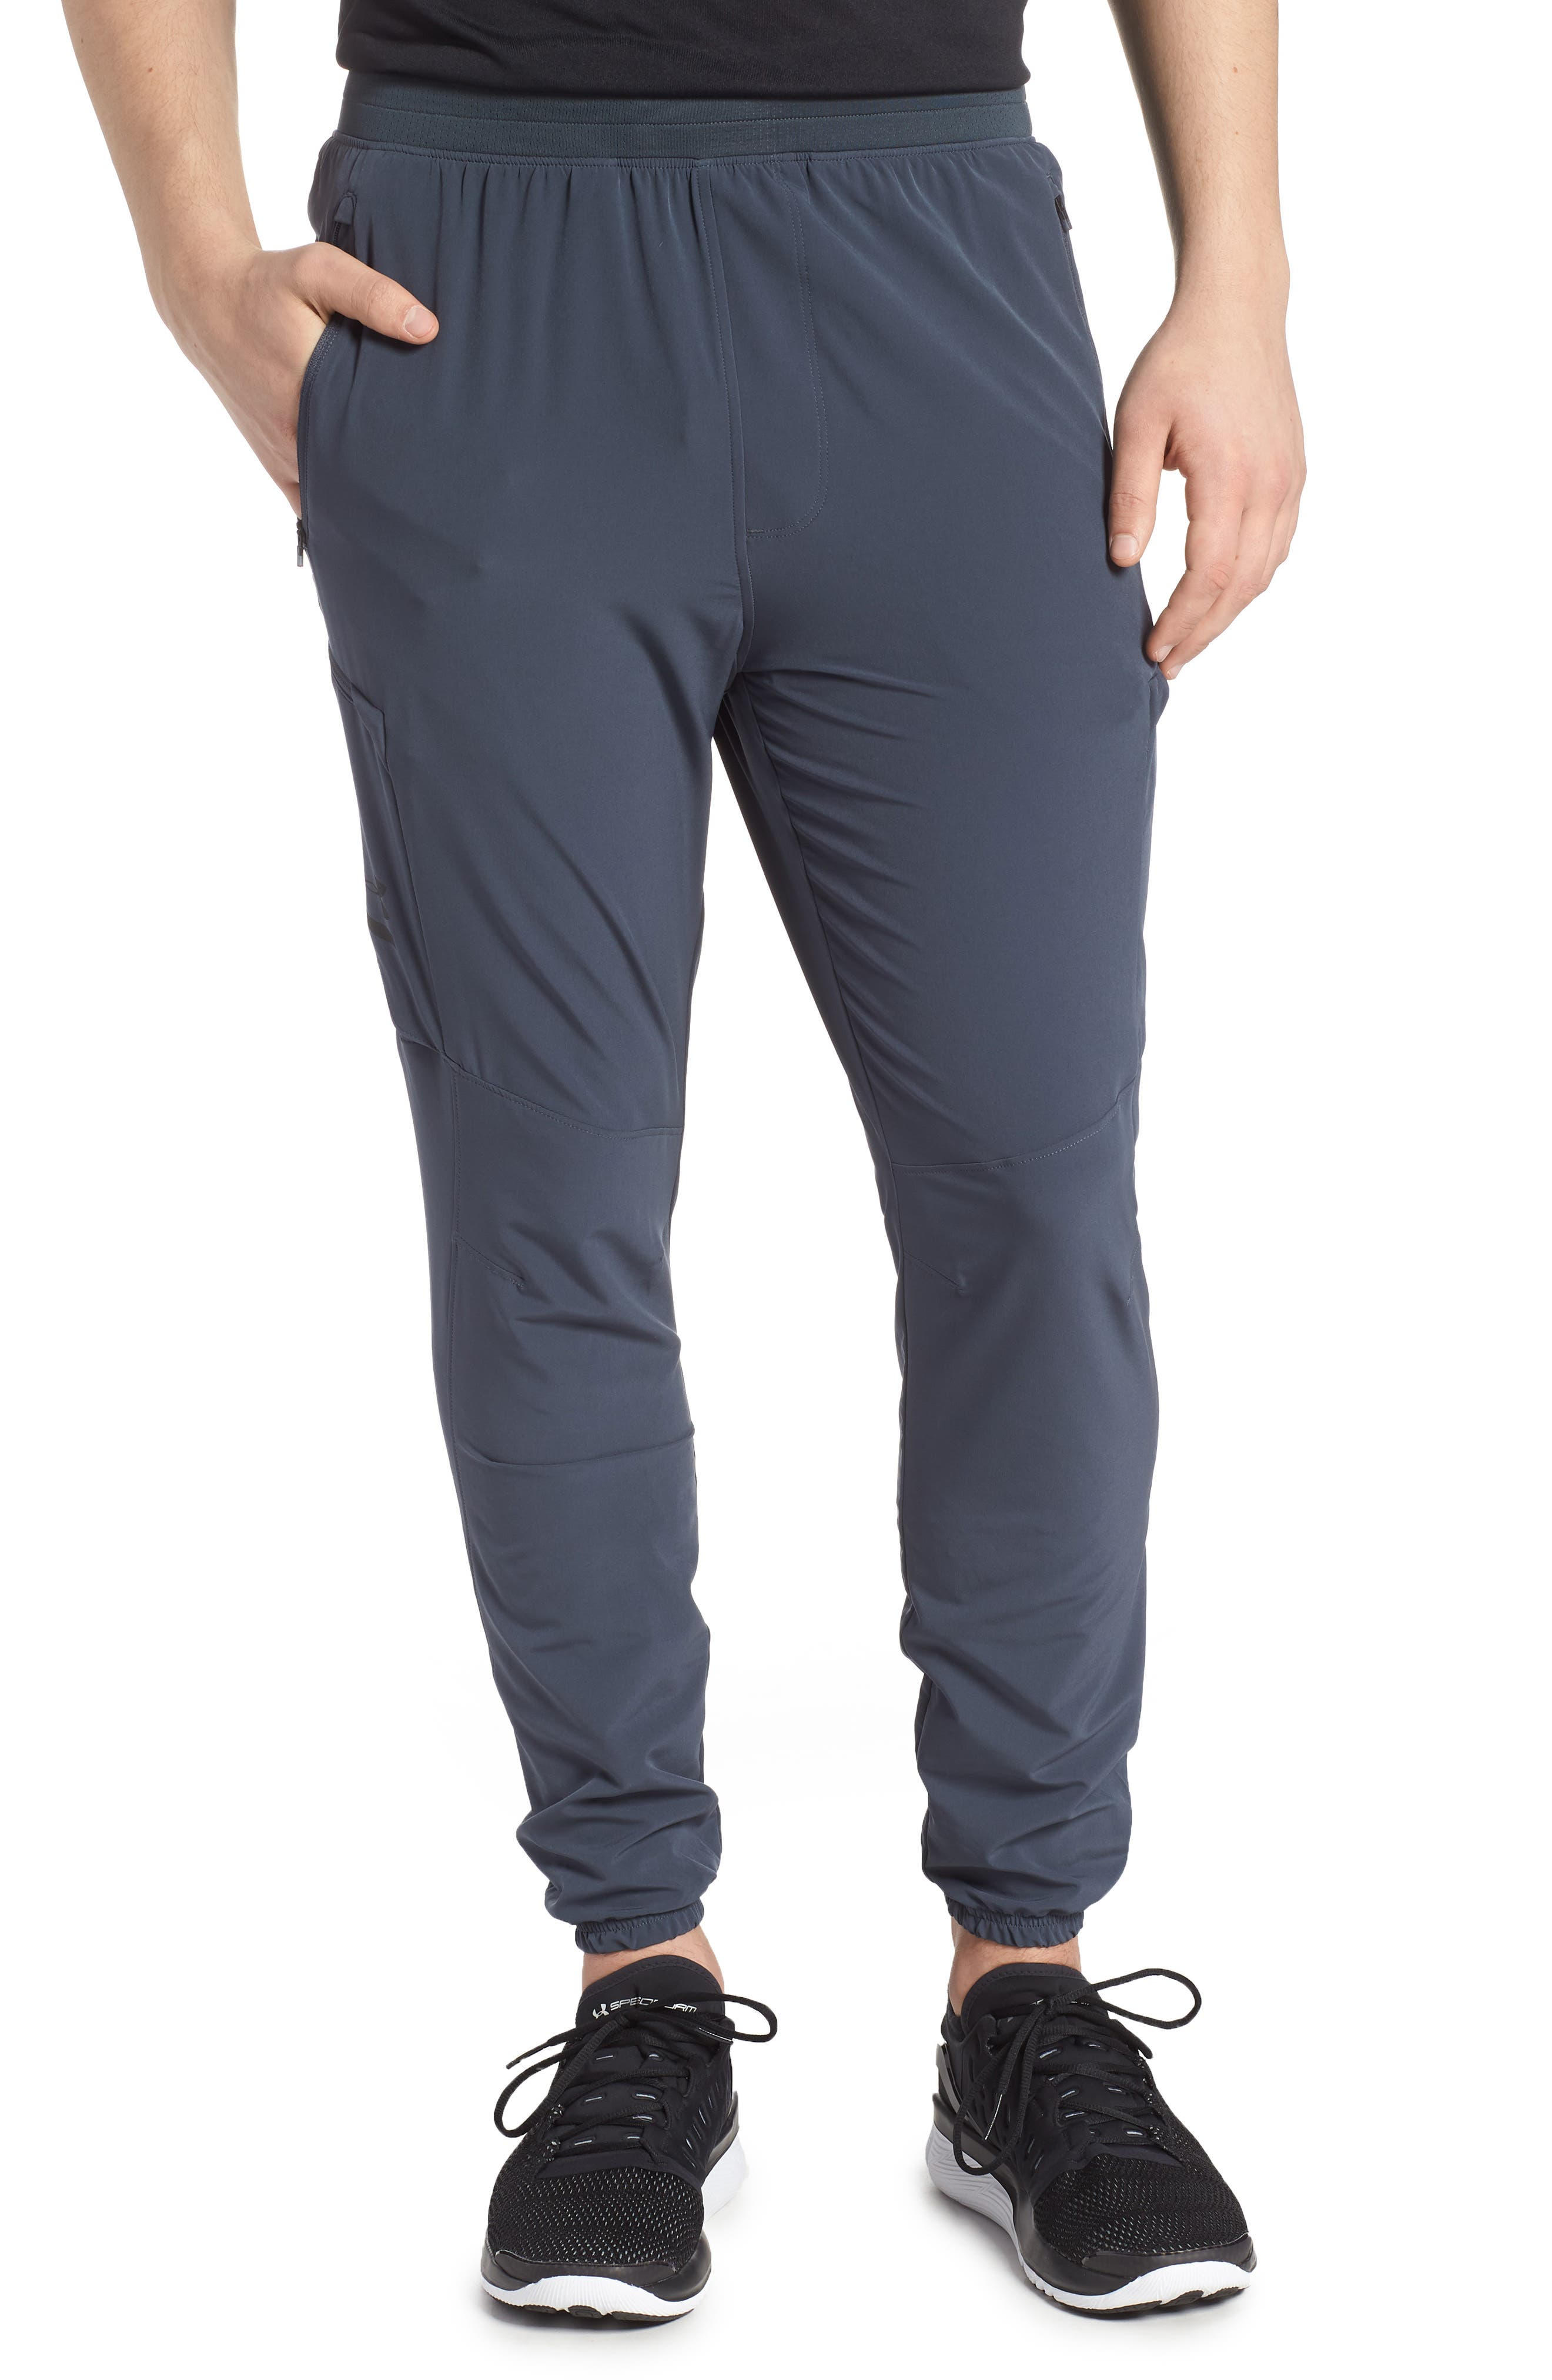 Perpetual Cargo Jogger Pants,                             Main thumbnail 1, color,                             Stealth Gray/ Black